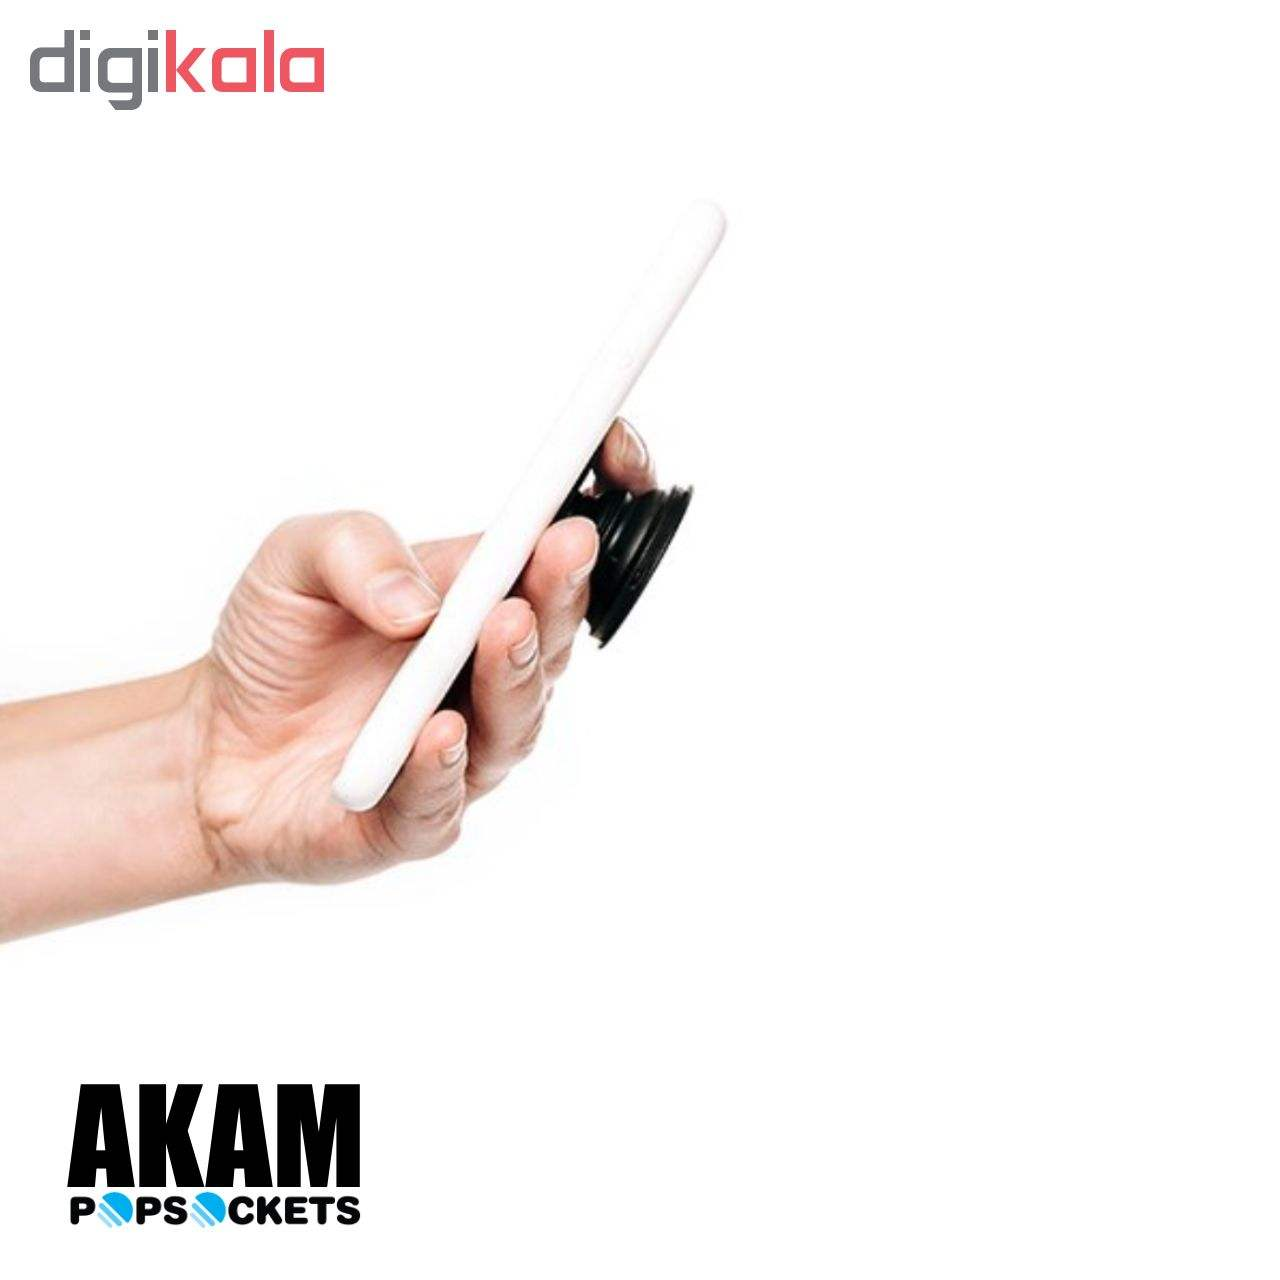 پایه نگهدارنده گوشی موبایل پاپ سوکت آکام مدل APS0211 main 1 8